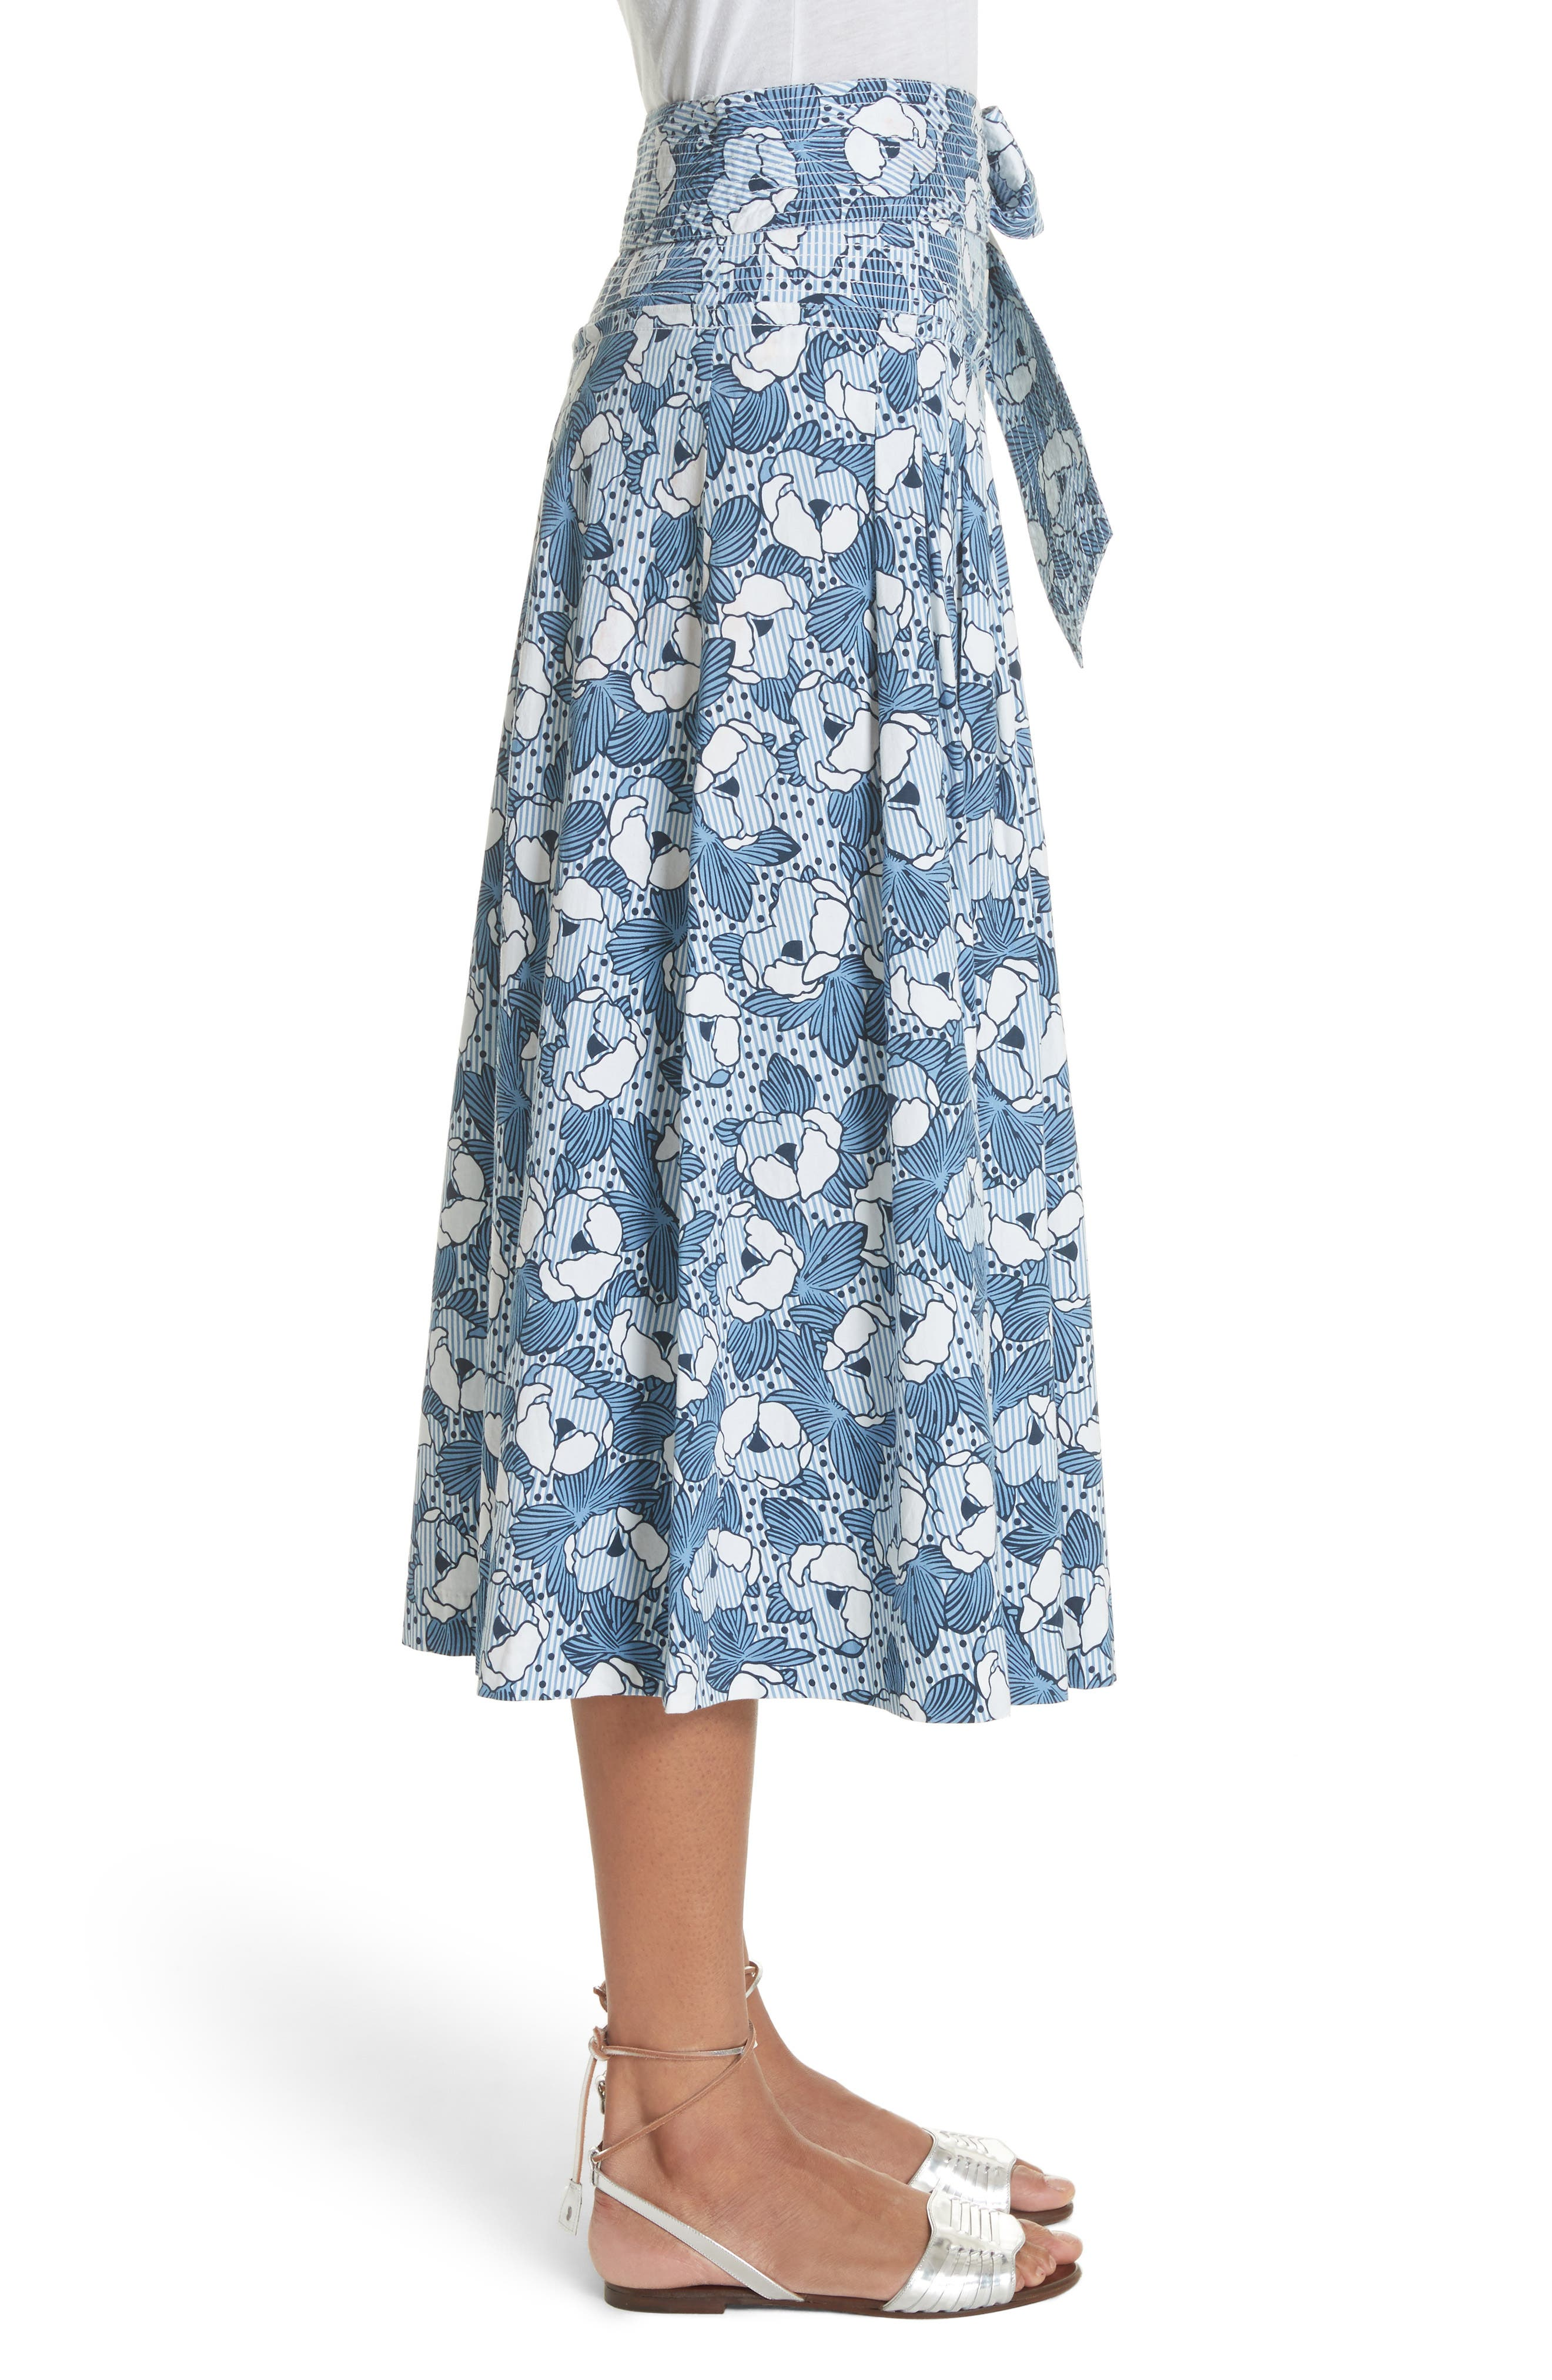 Caralina Floral Print Midi Skirt,                             Alternate thumbnail 3, color,                             Blue/ White